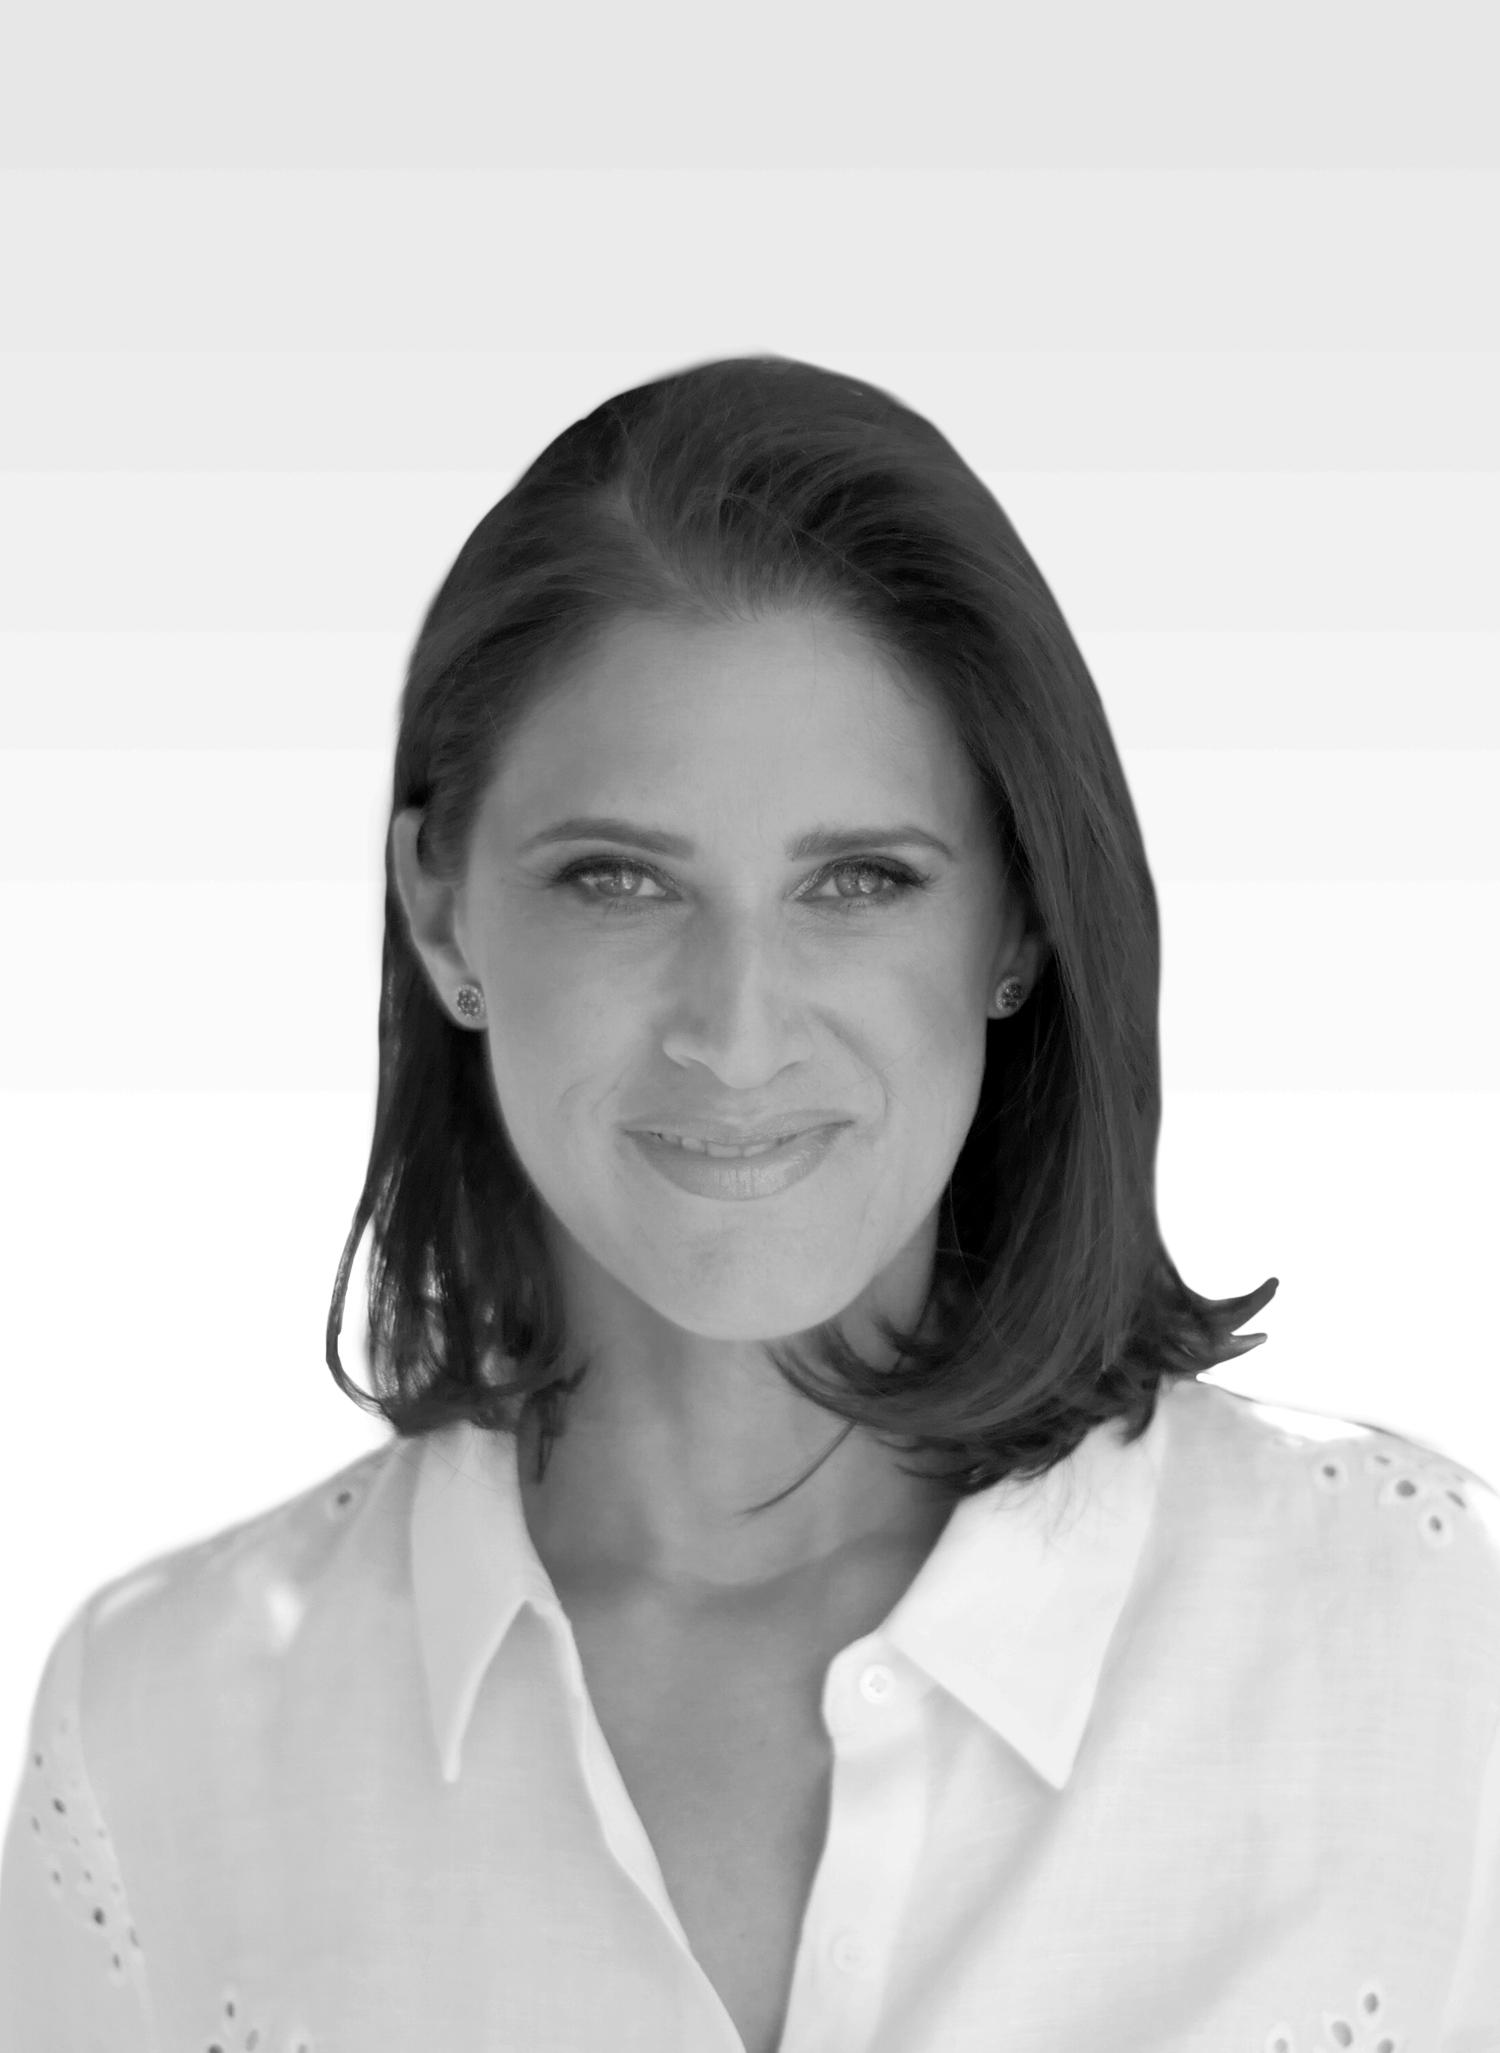 Valeria Kelly